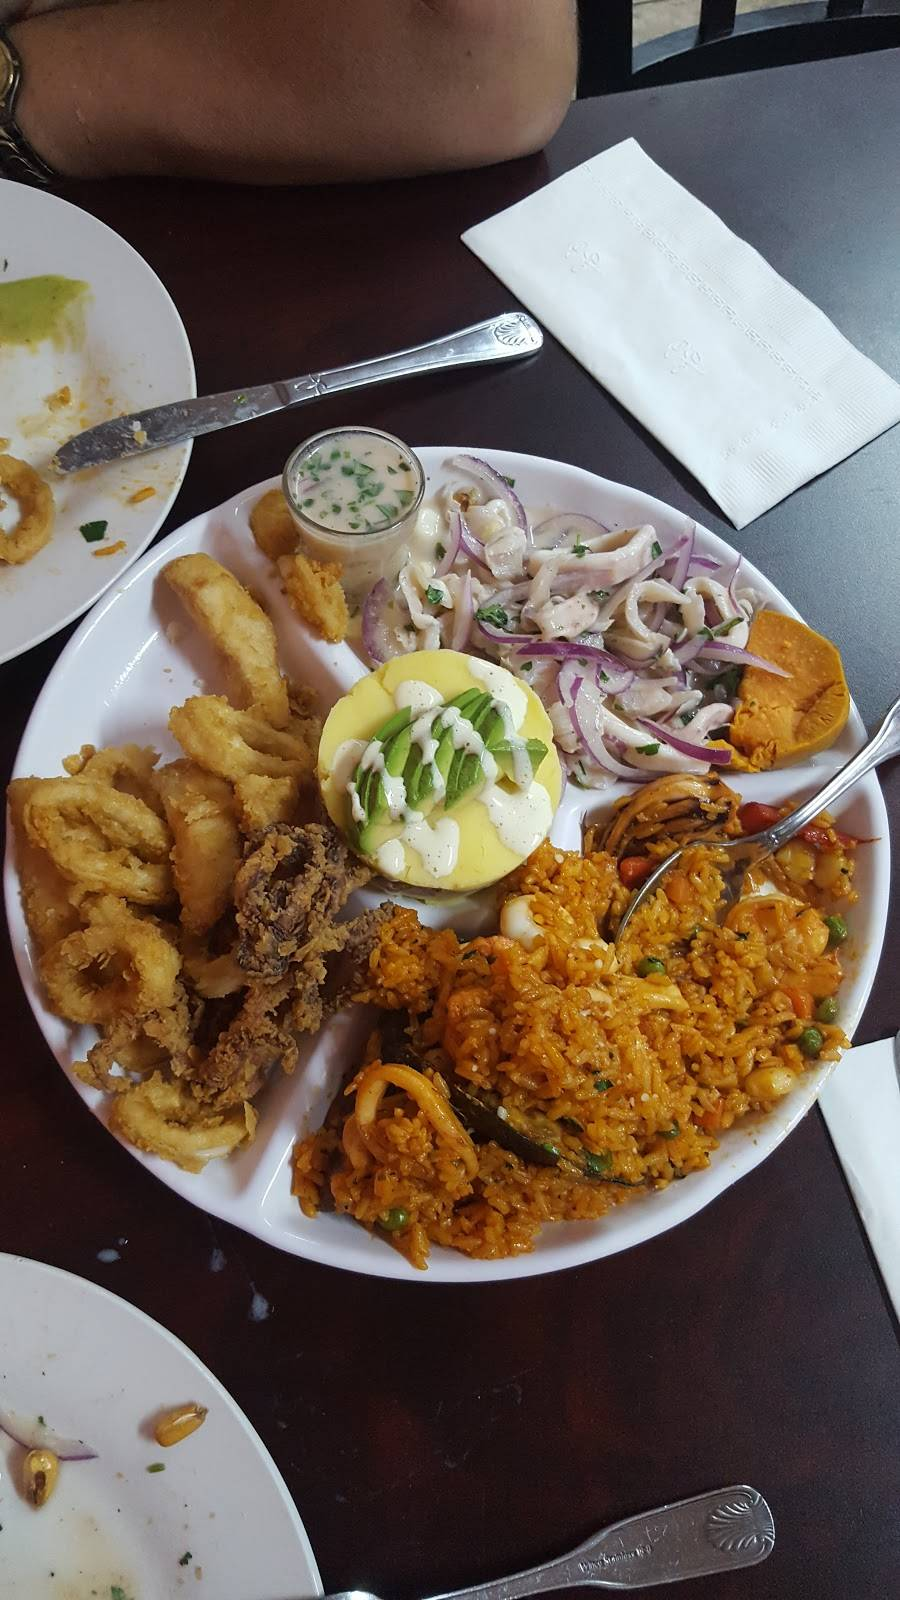 Mistura Peruana | restaurant | 86-6 Jamaica Ave, Woodhaven, NY 11421, USA | 7184411461 OR +1 718-441-1461